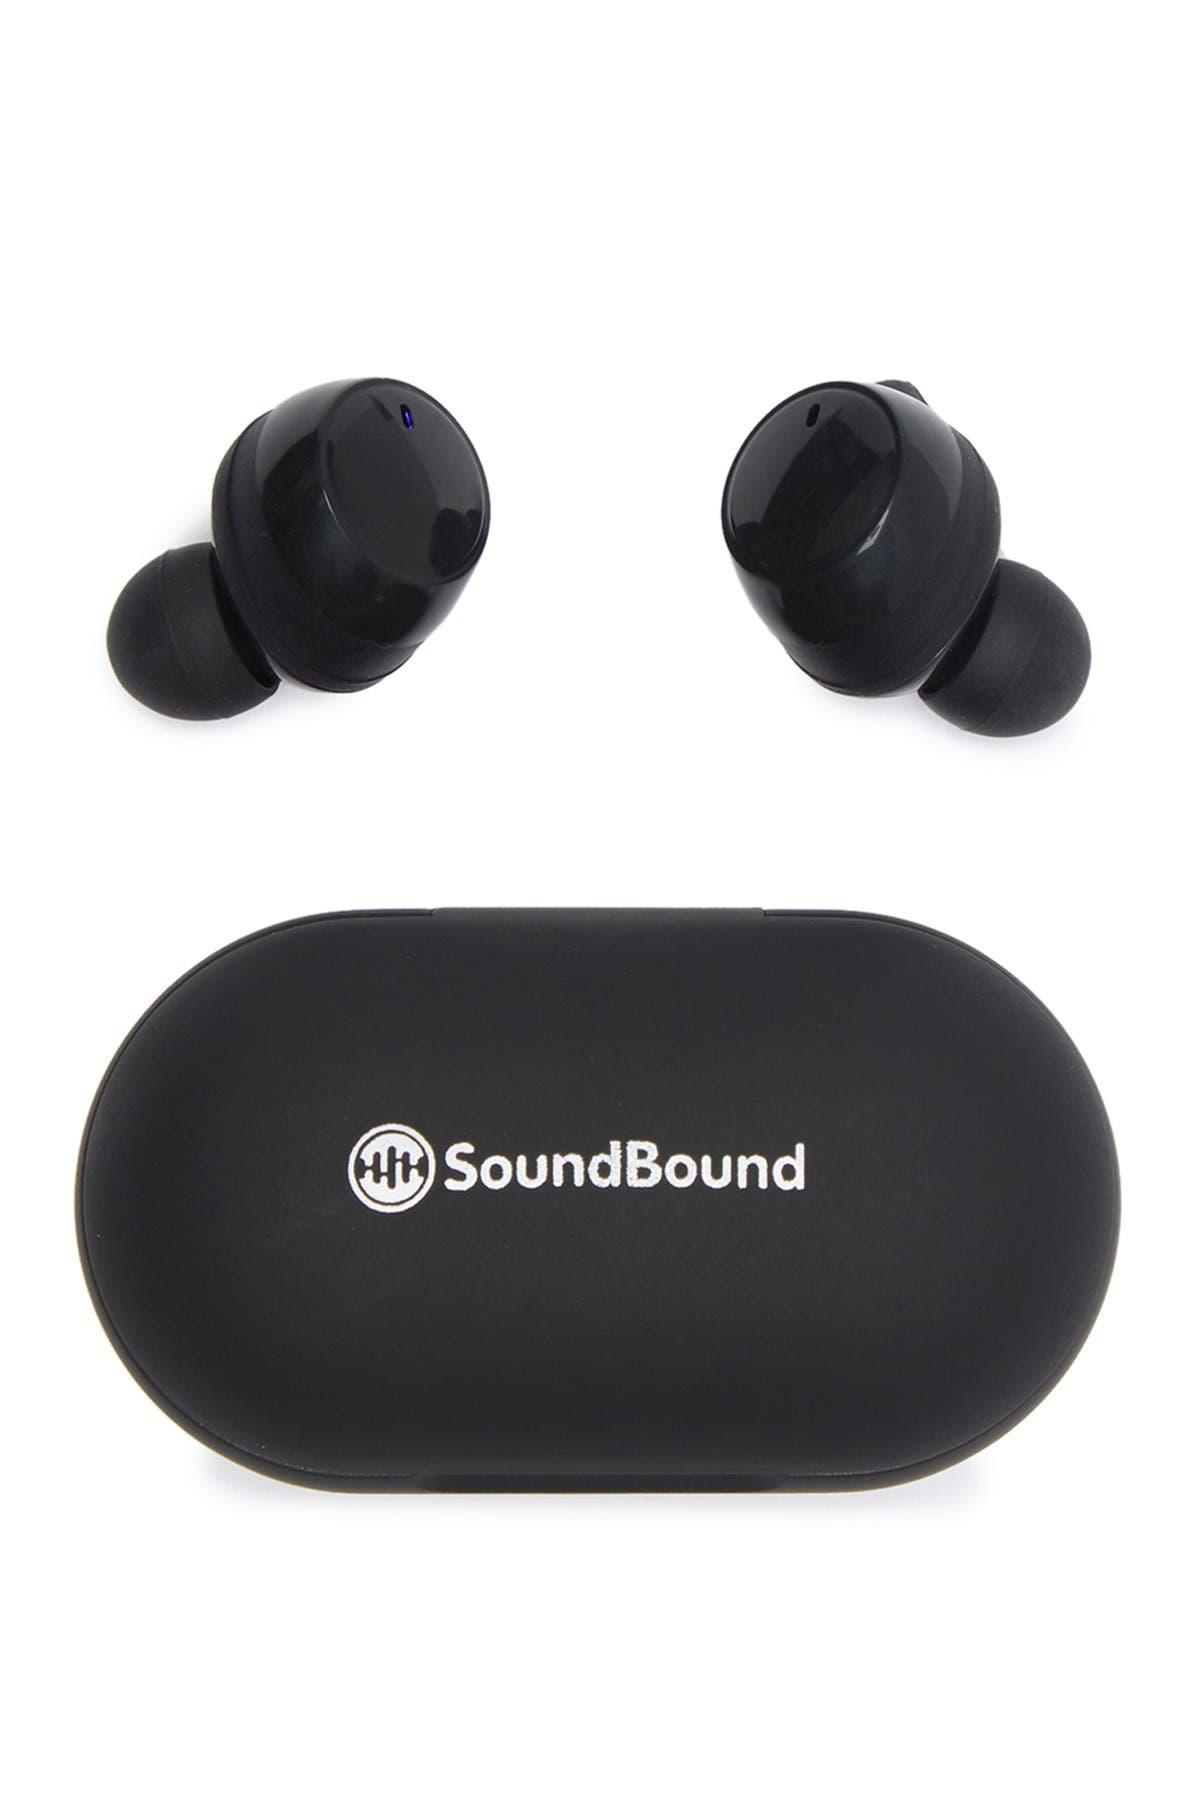 Image of LIFEWARE SoundBound True Wireless Stereo Rubberized Sport Sweat Resistant Earbuds